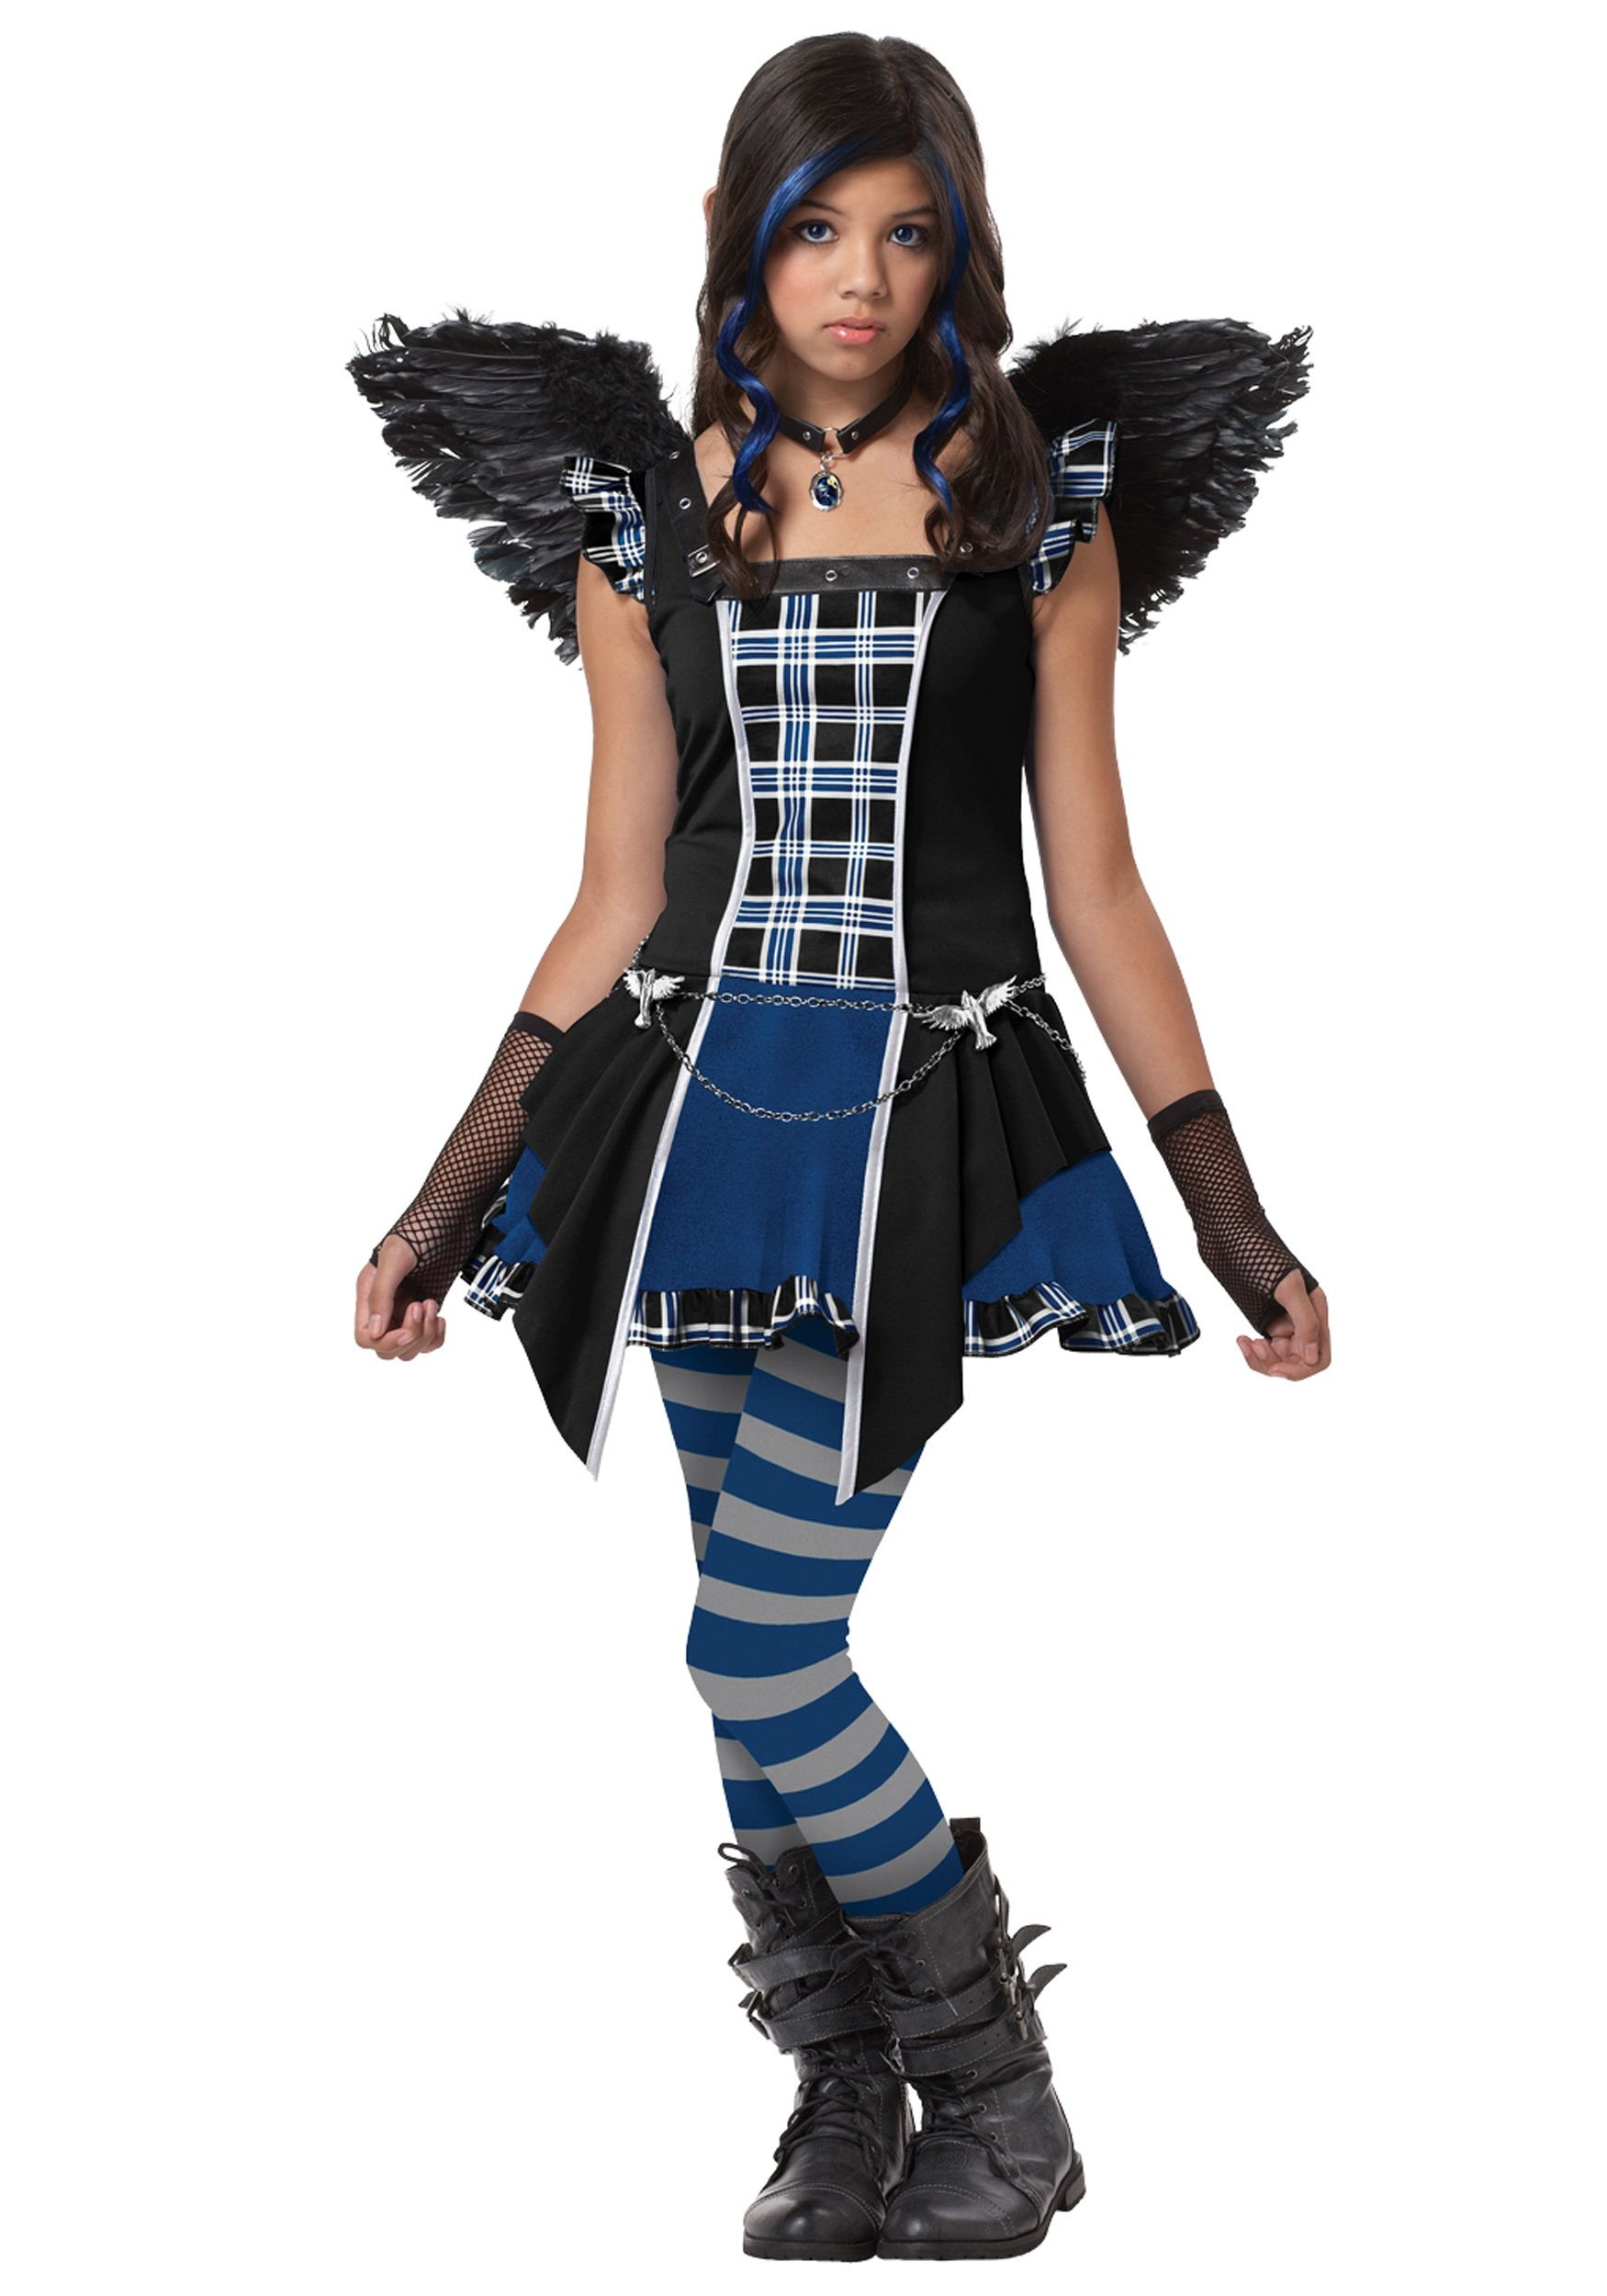 tween costumes for girls Costume Ideas Classic Halloween